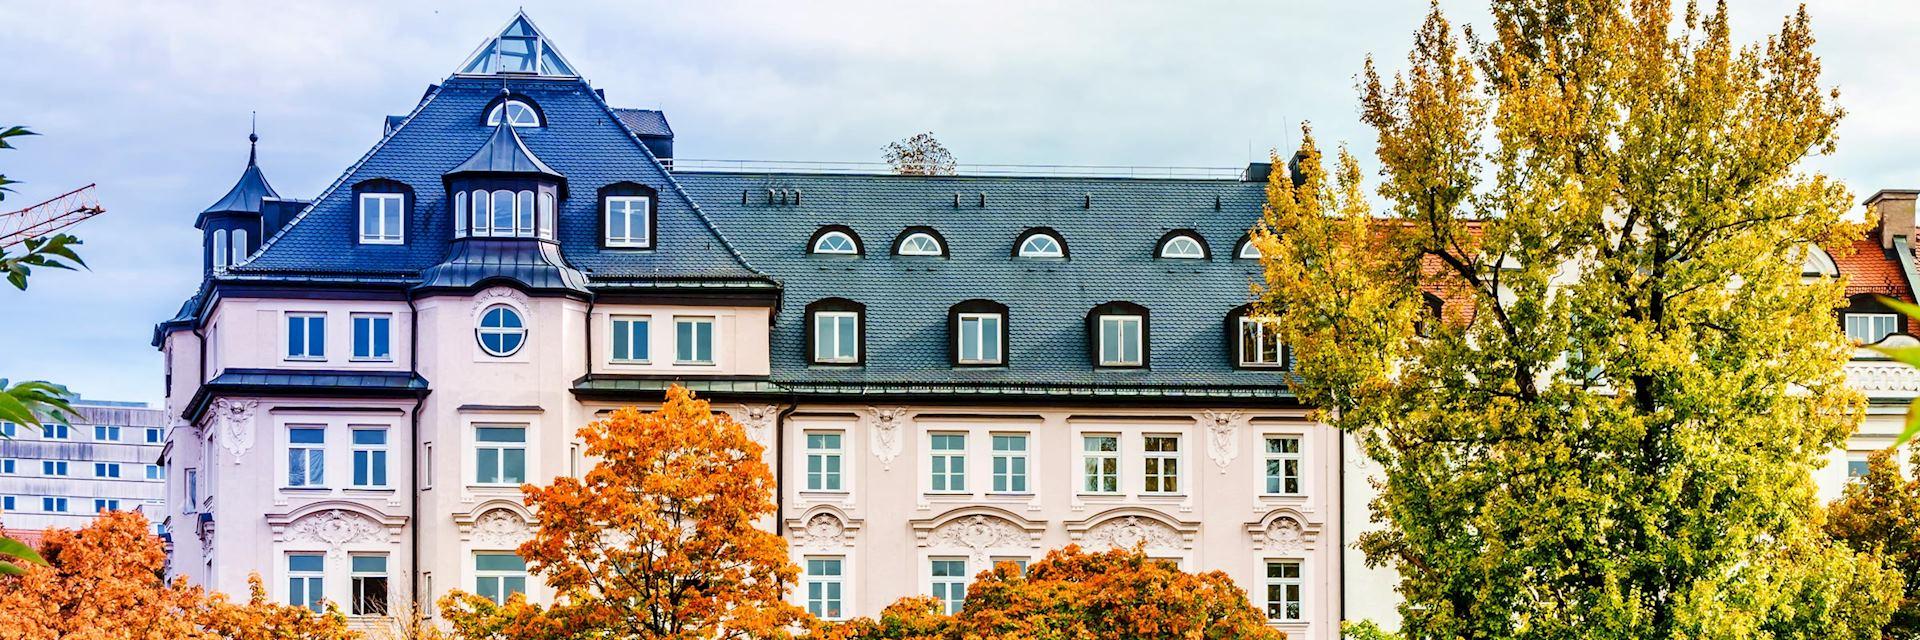 Residential building Munich